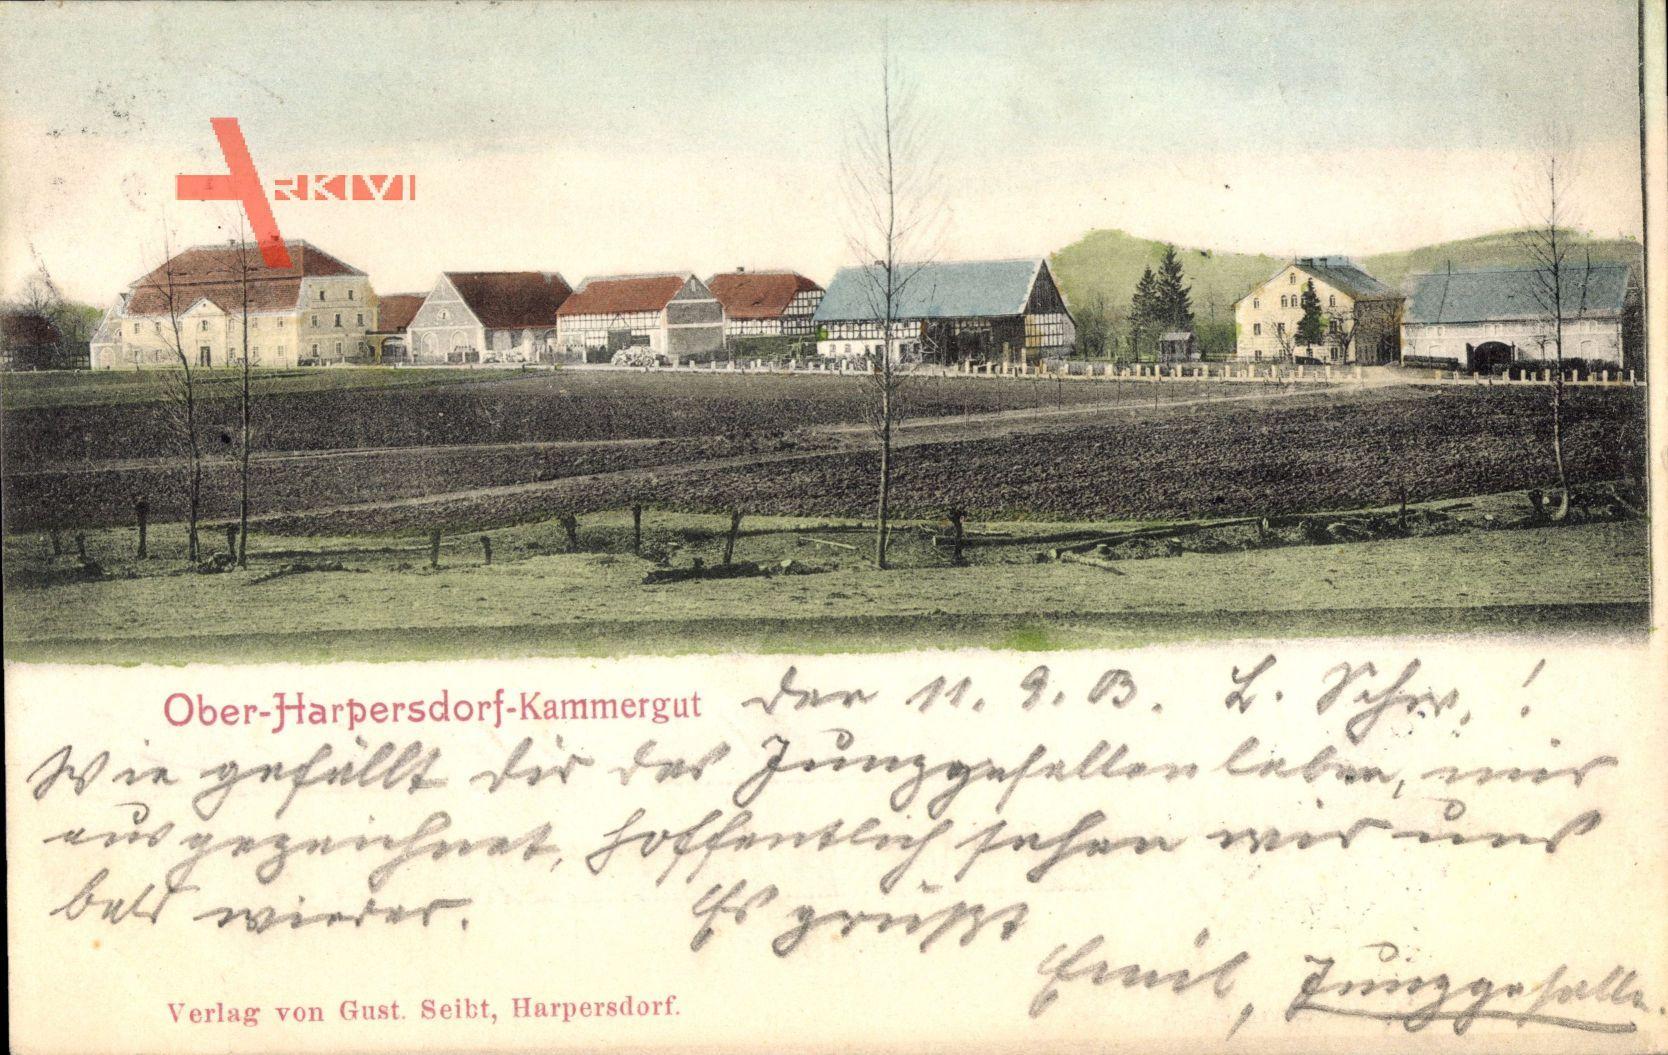 Ober Harpersdorf Kammergut, Blick auf den Ort, Herbst